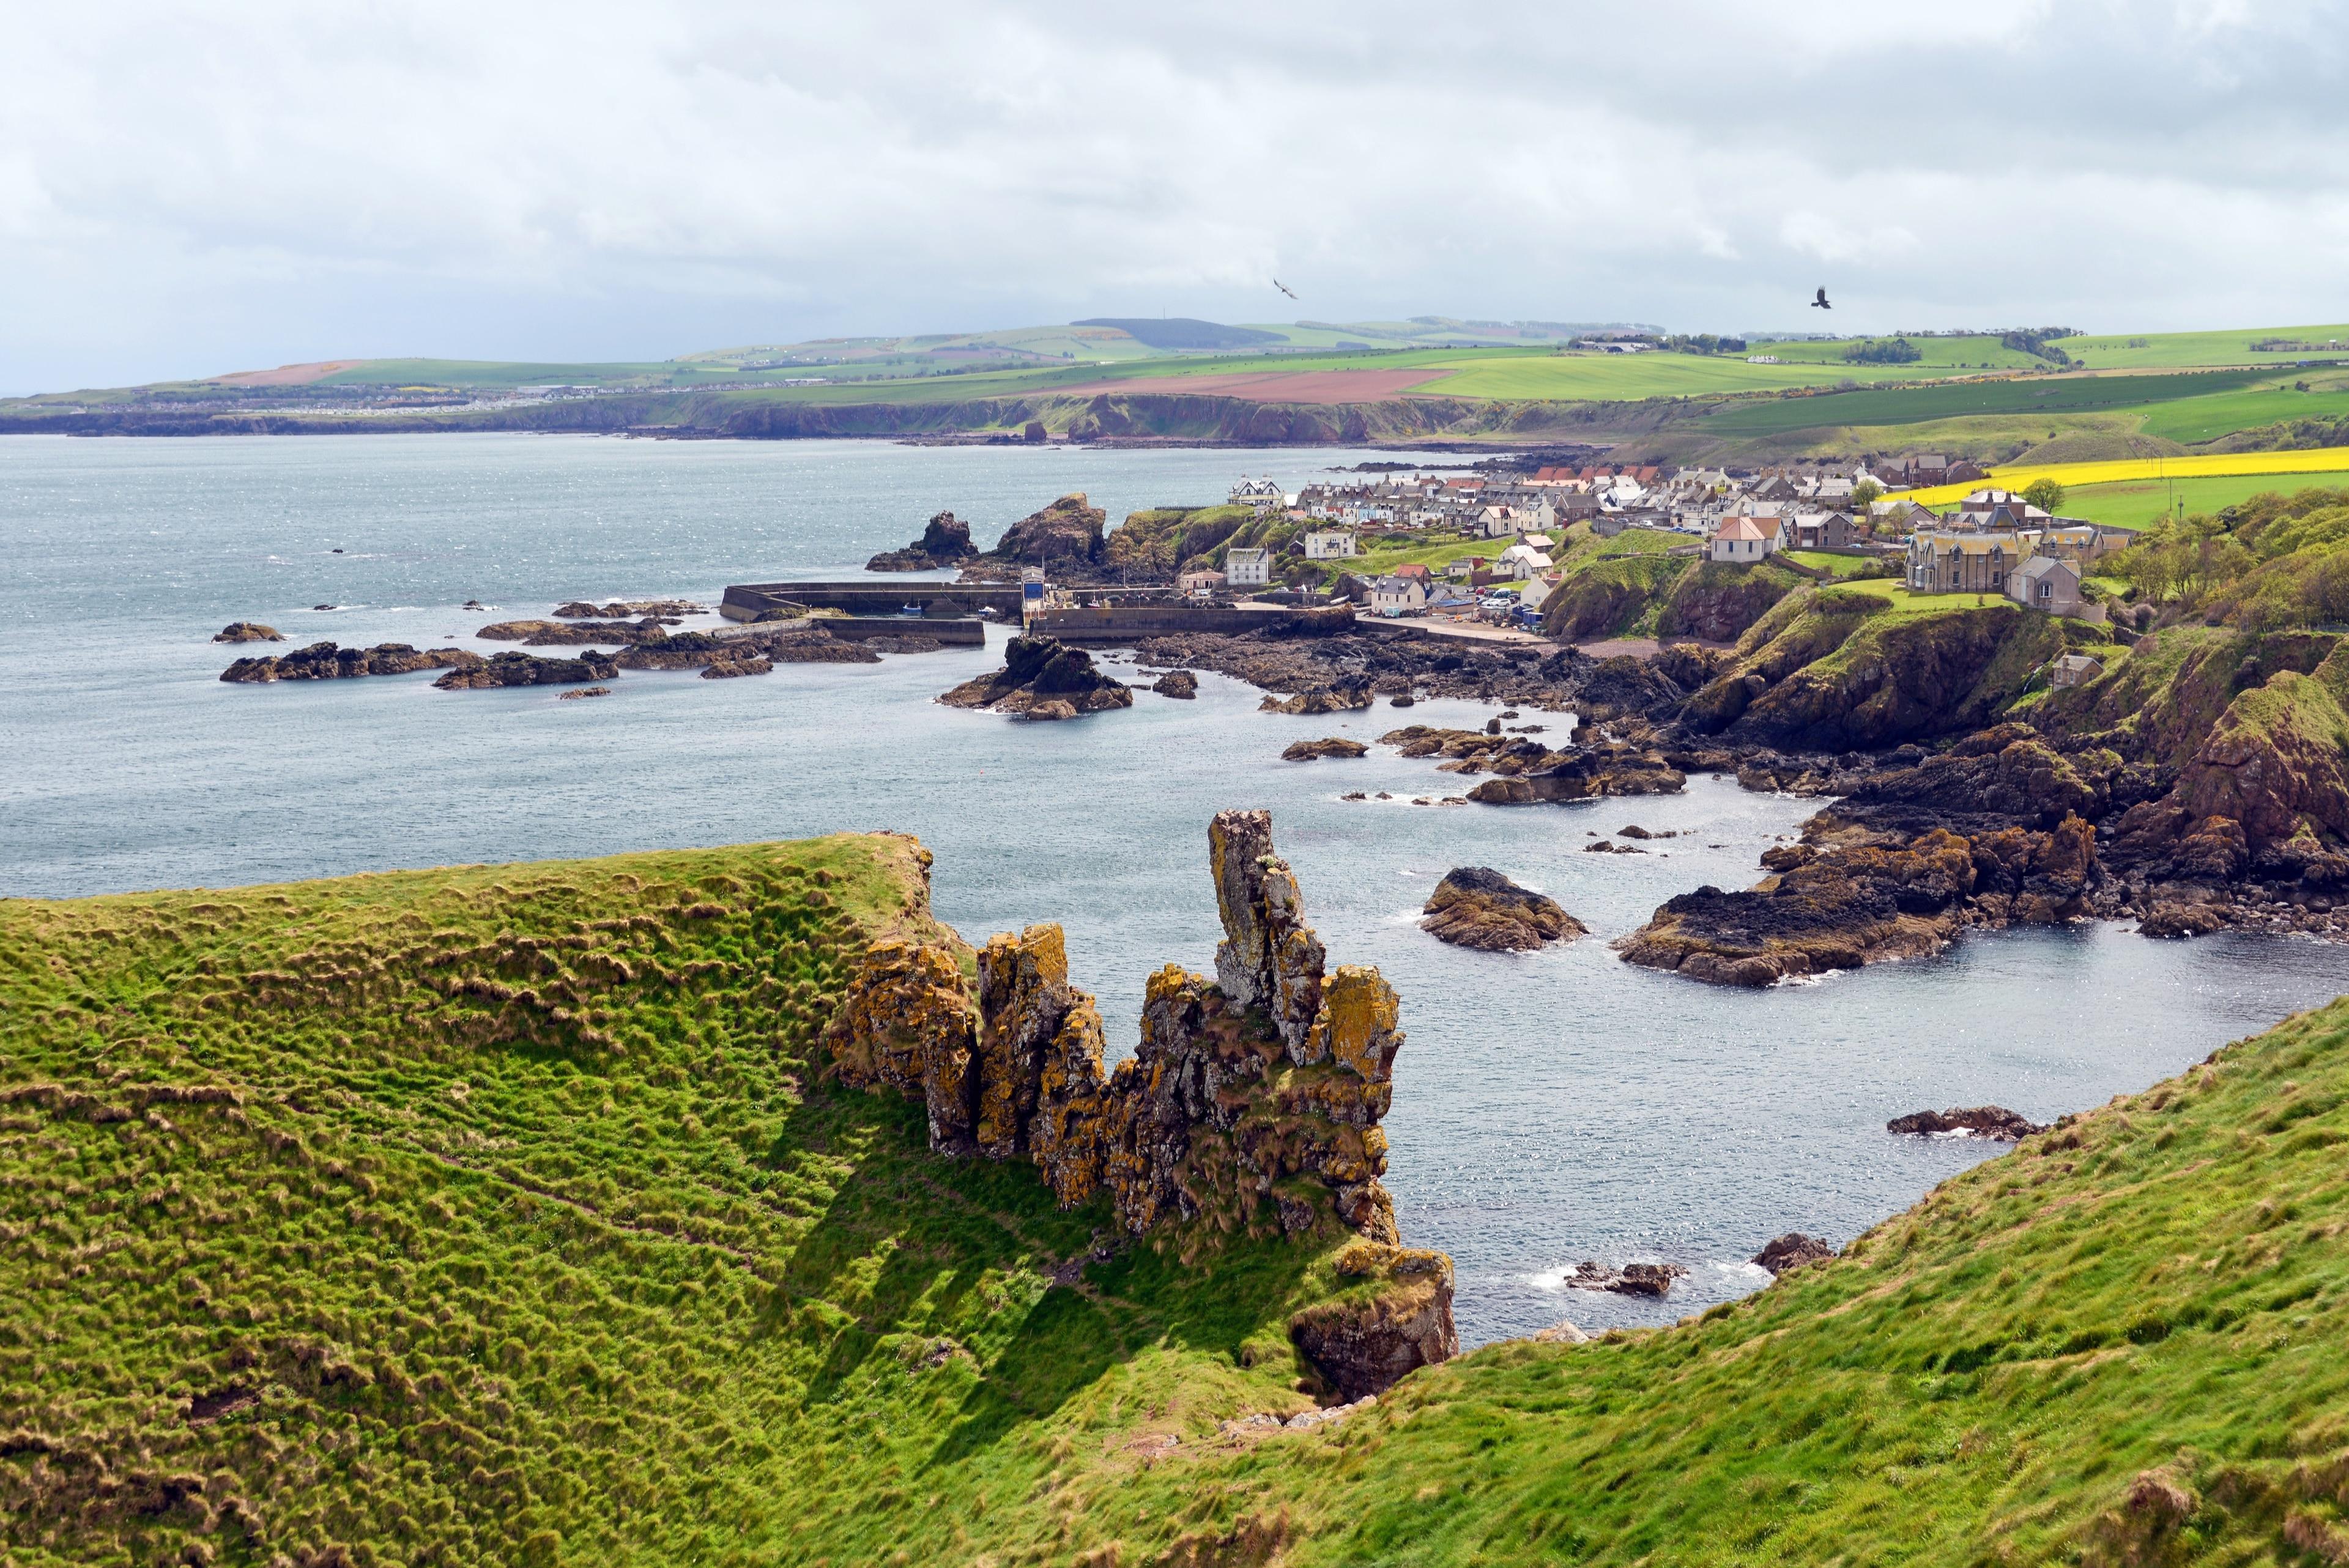 Scottish Borders, Scotland, United Kingdom